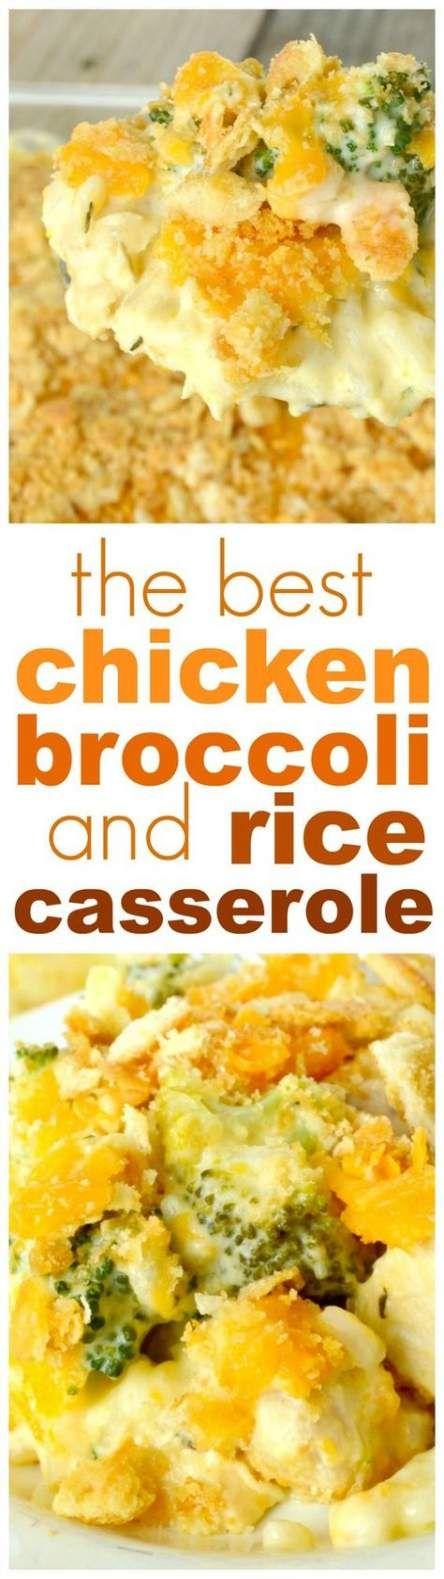 Best chicken recipes casserole ritz crackers comfort foods 45 Ideas